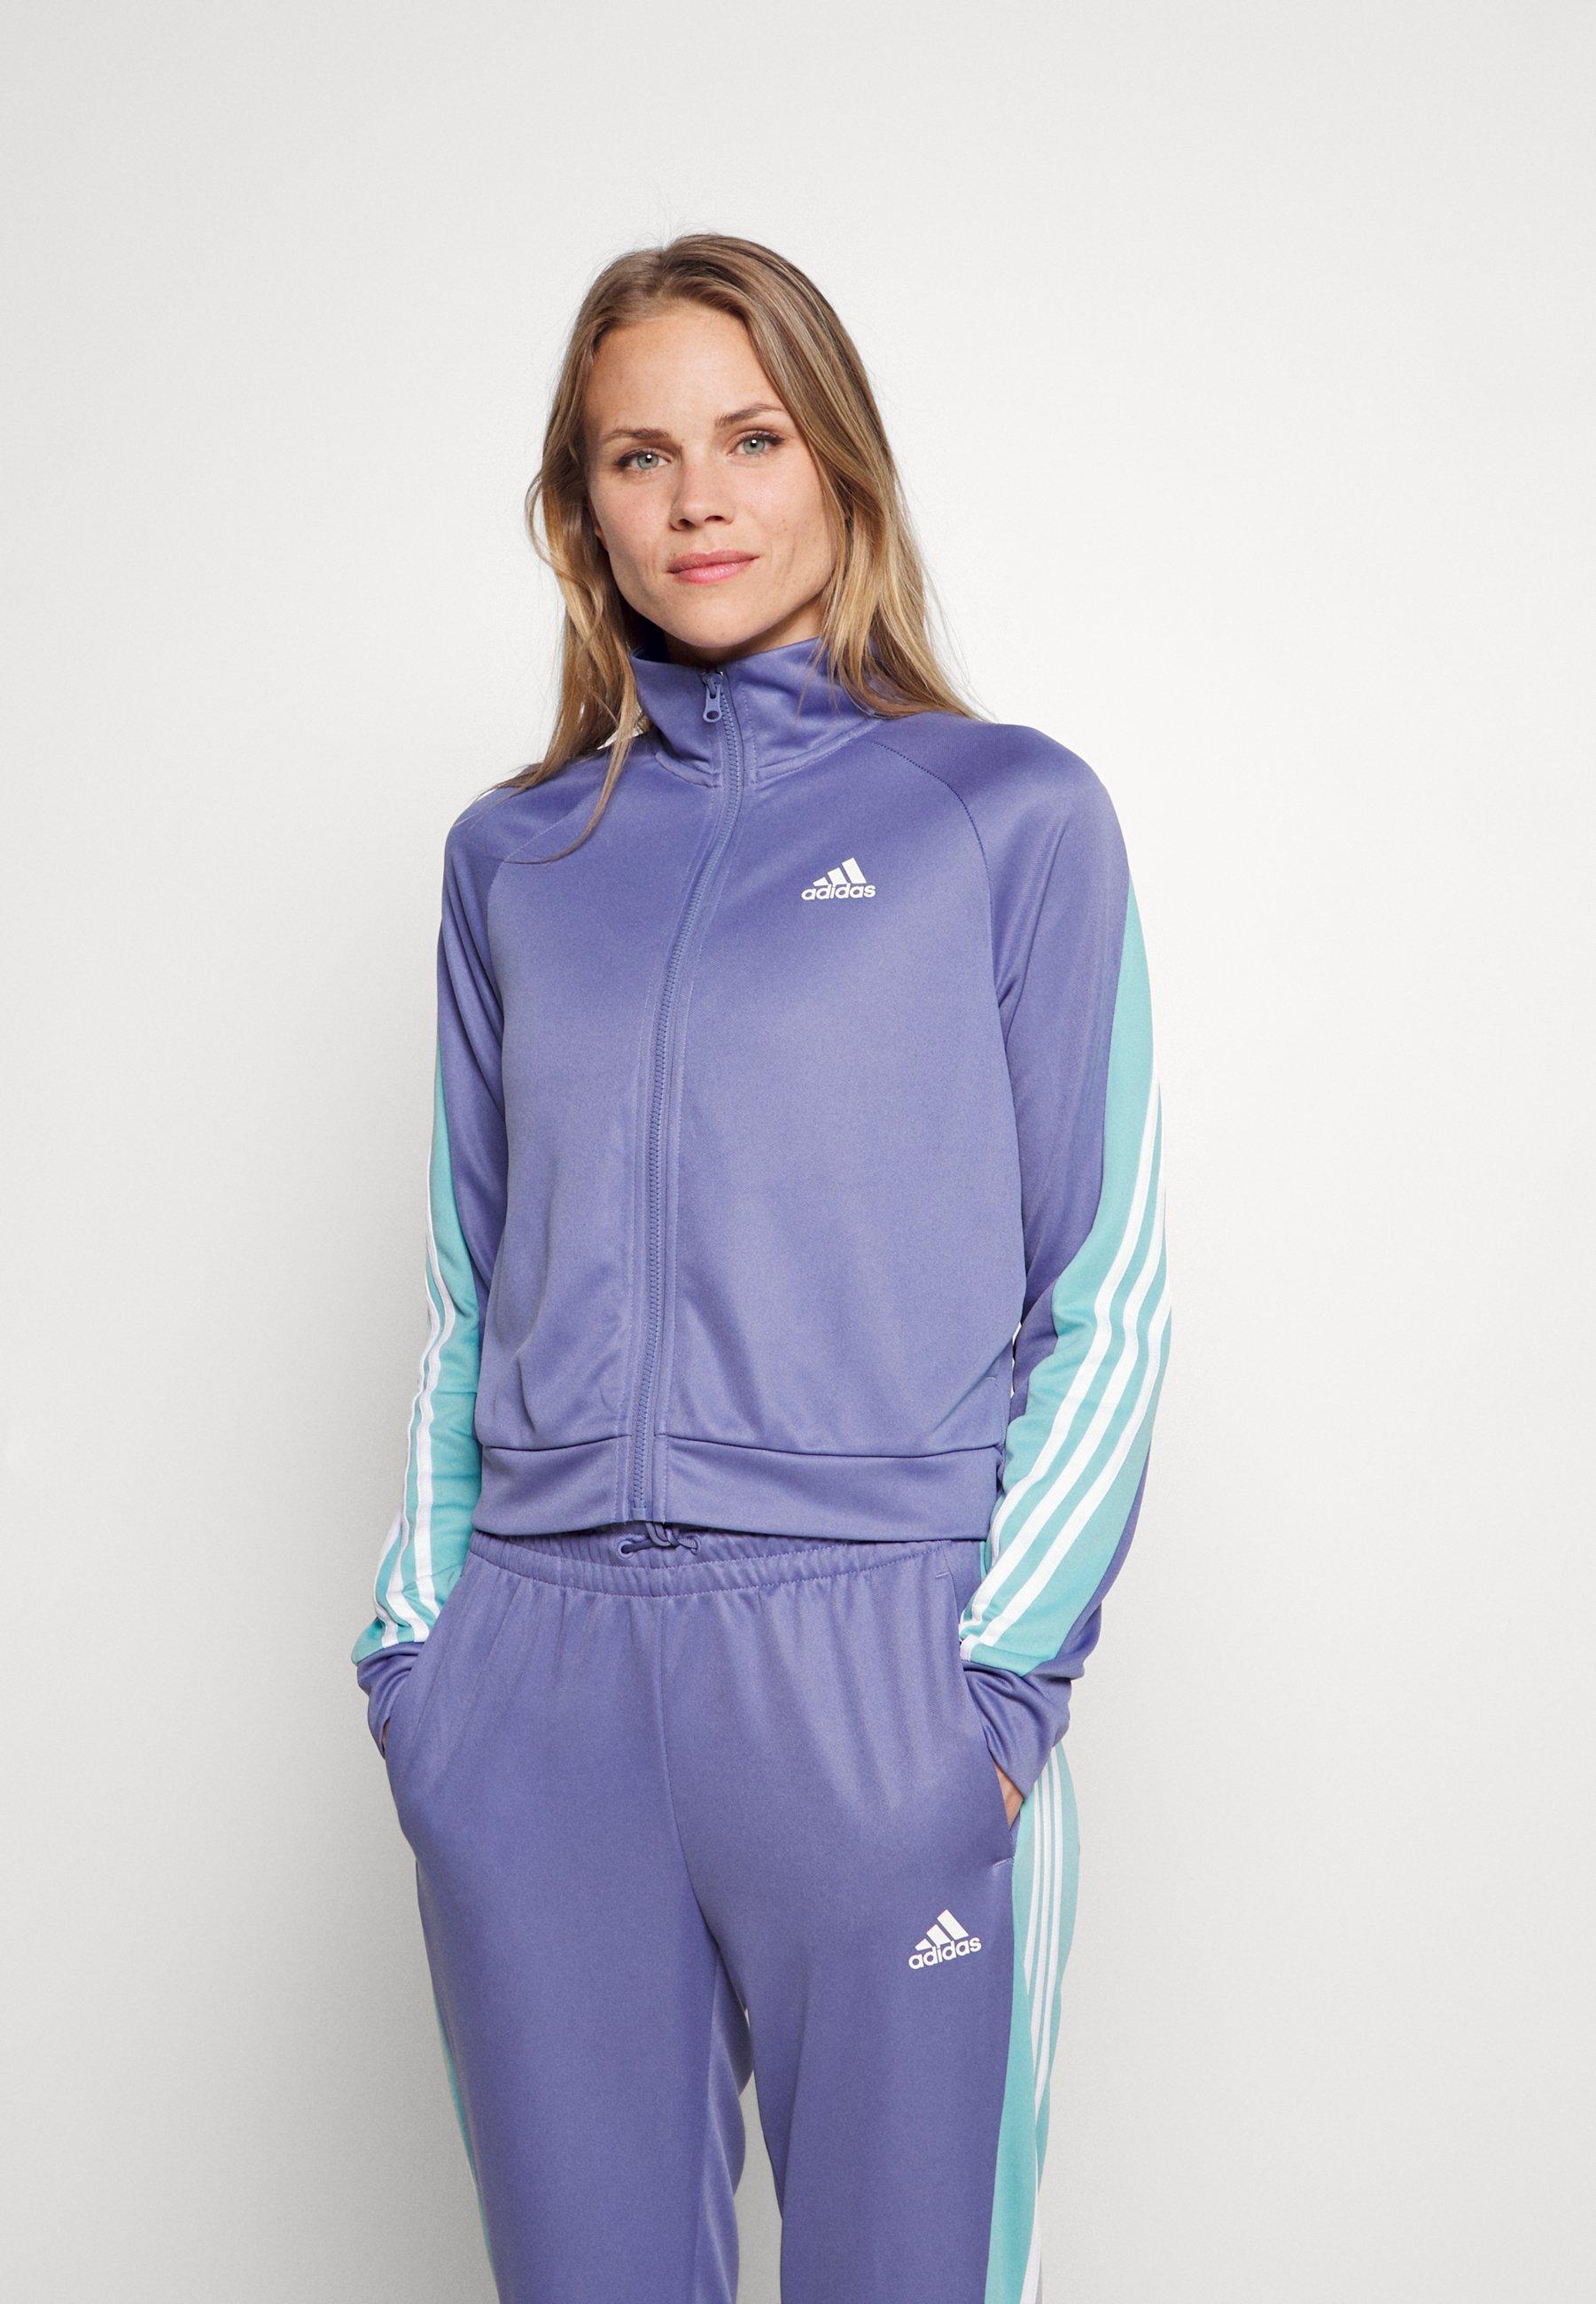 Damen TEAMSPORT - Trainingsanzug